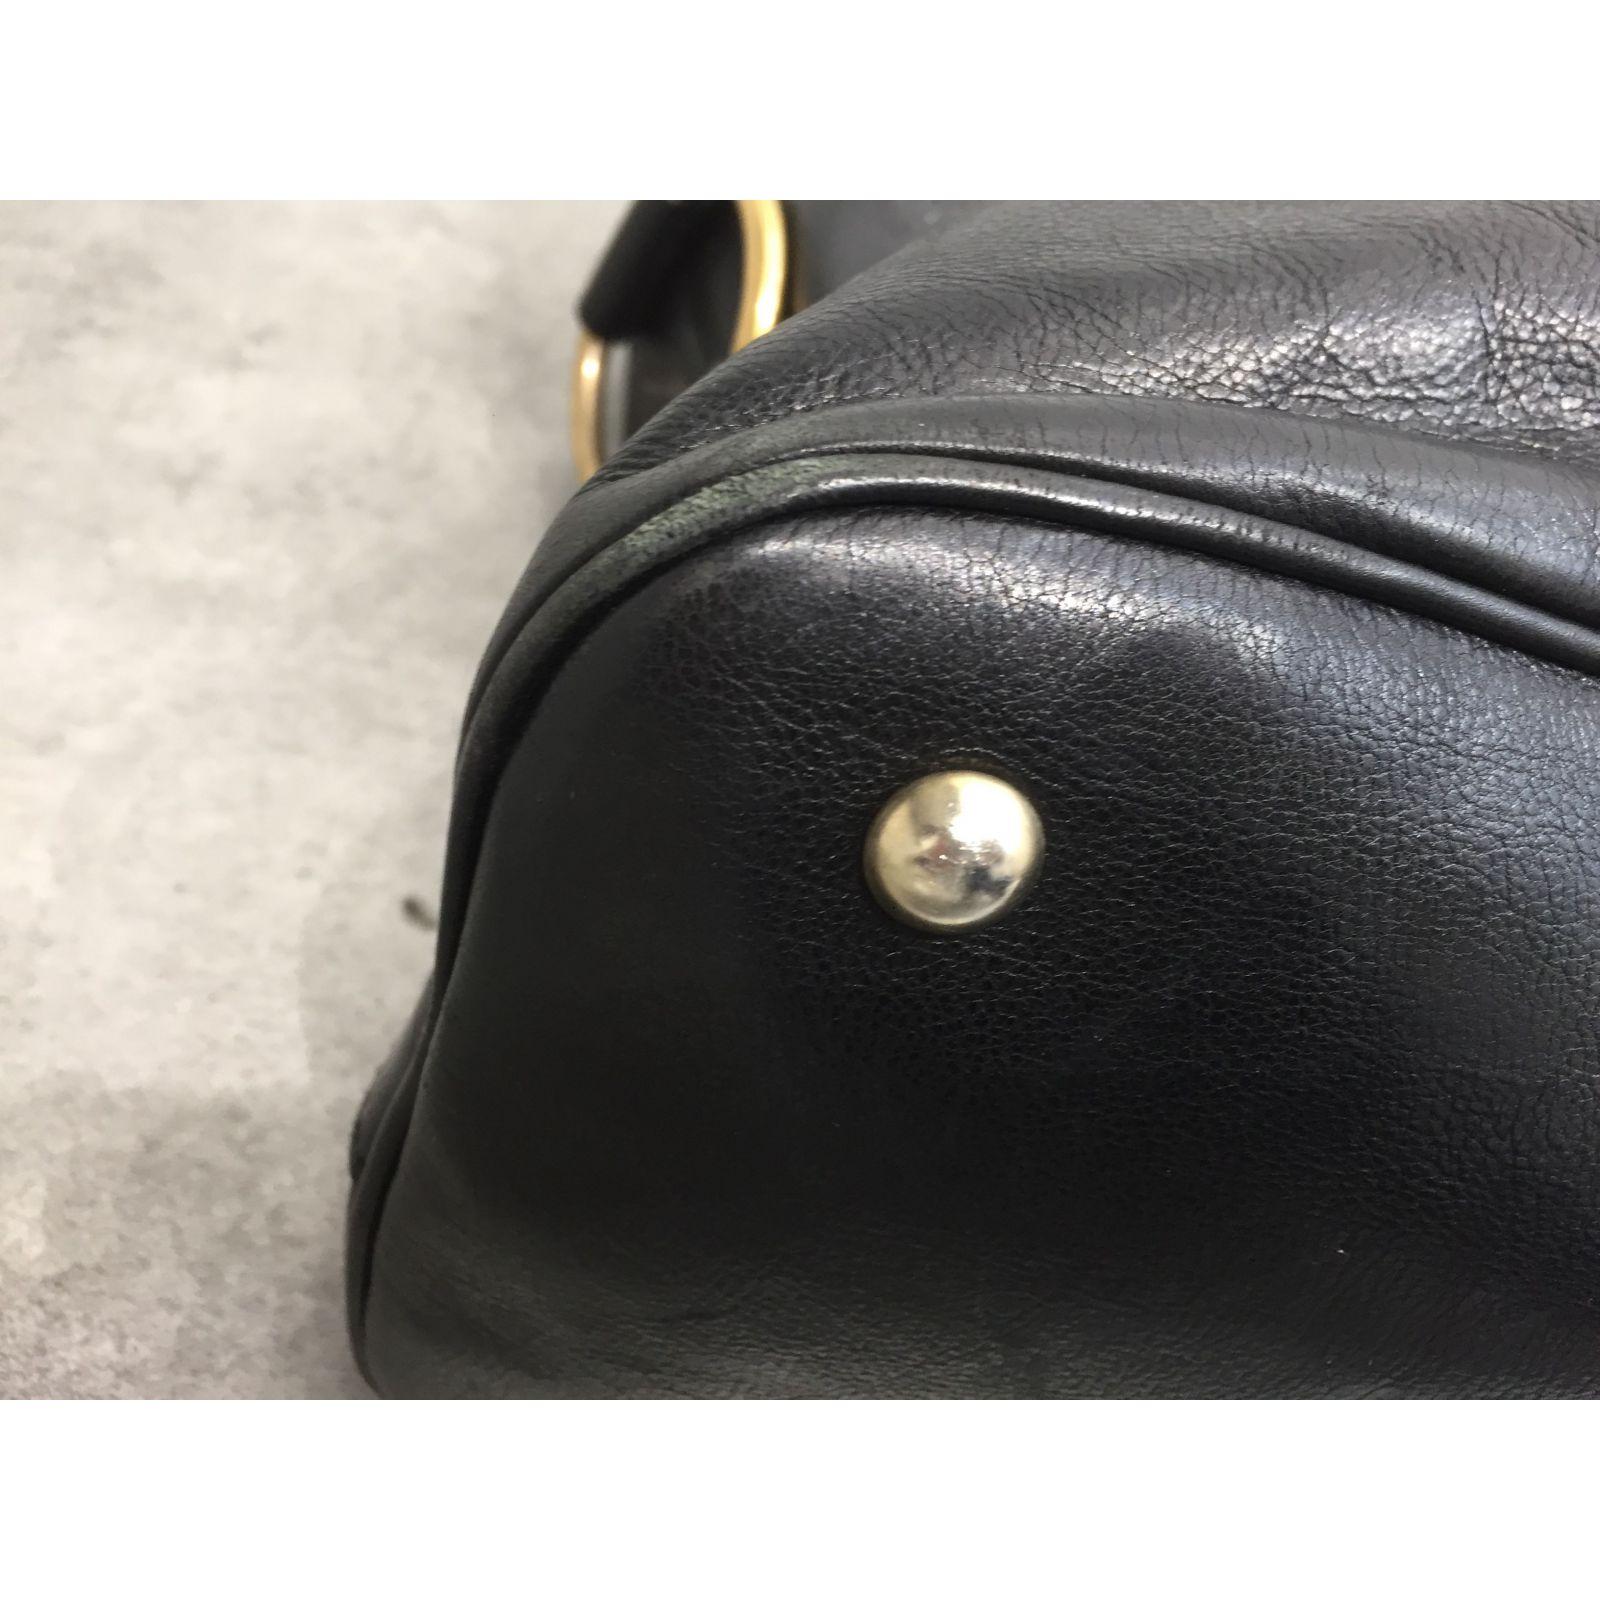 Yves Saint Laurent Handbags | Ysl Monogramme | Ysl Clutch Sale